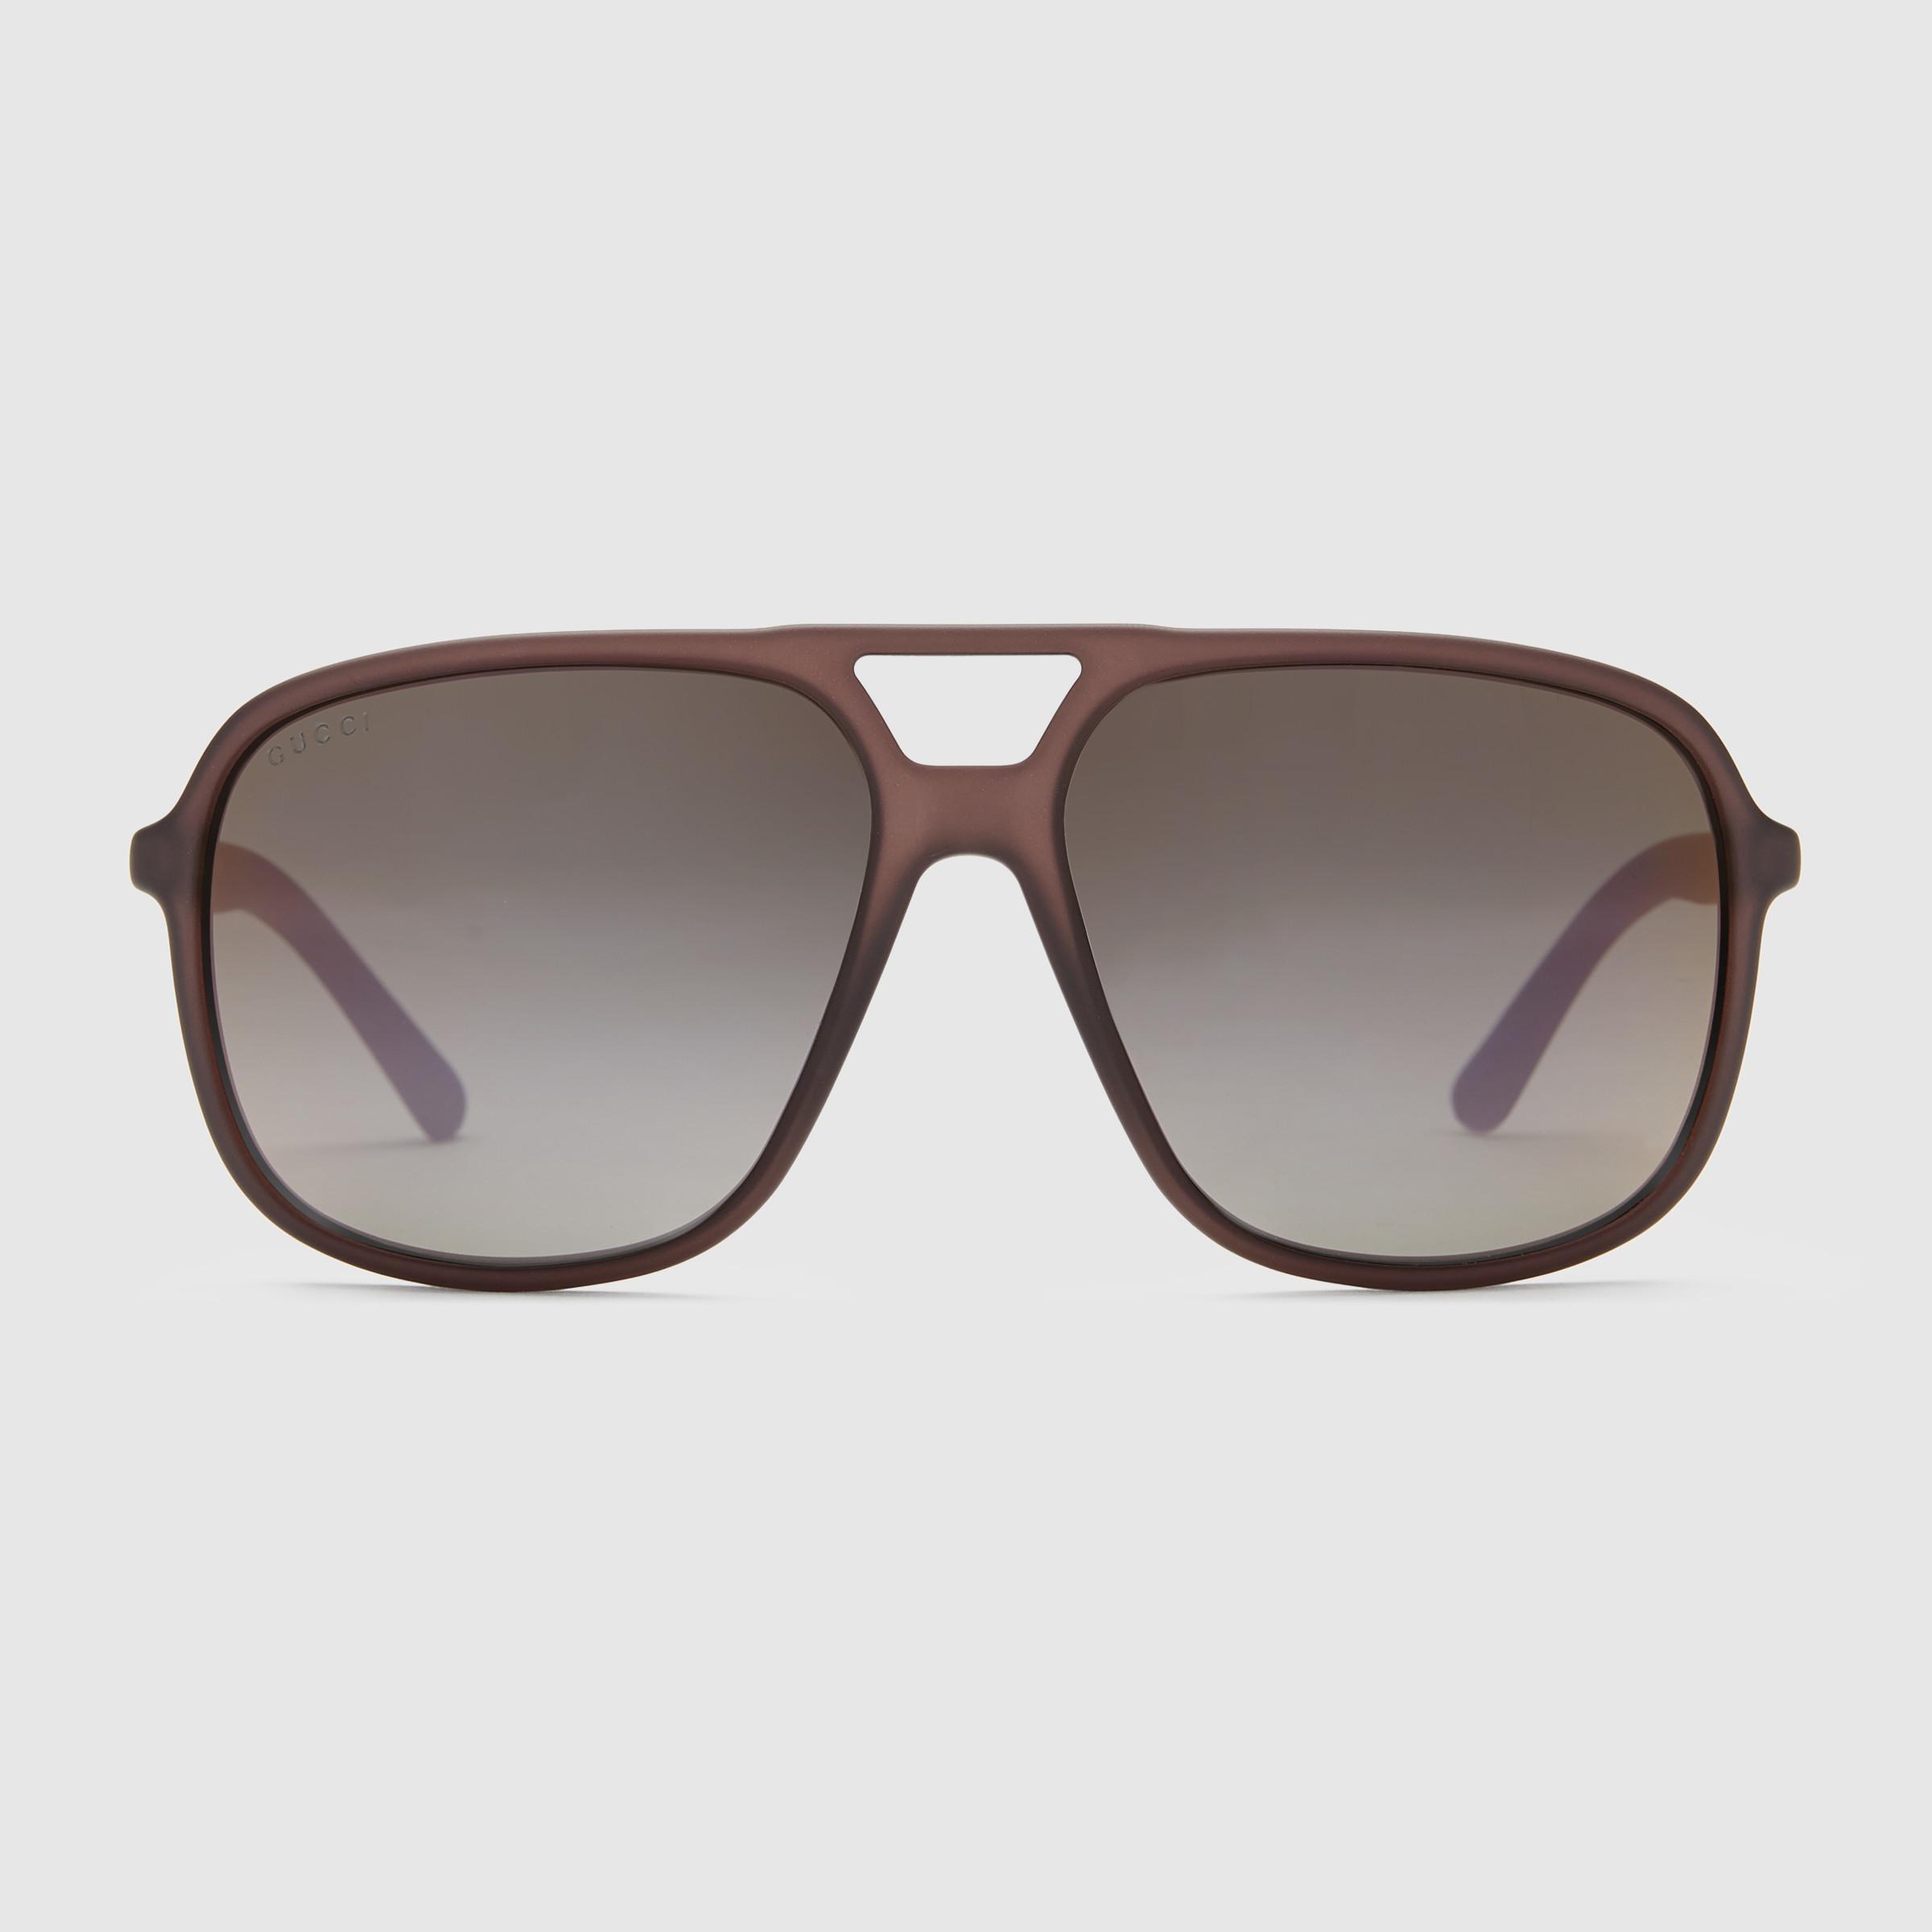 abde9b09dd8 Medium Aviator Sunglasses Gucci Logo Temple